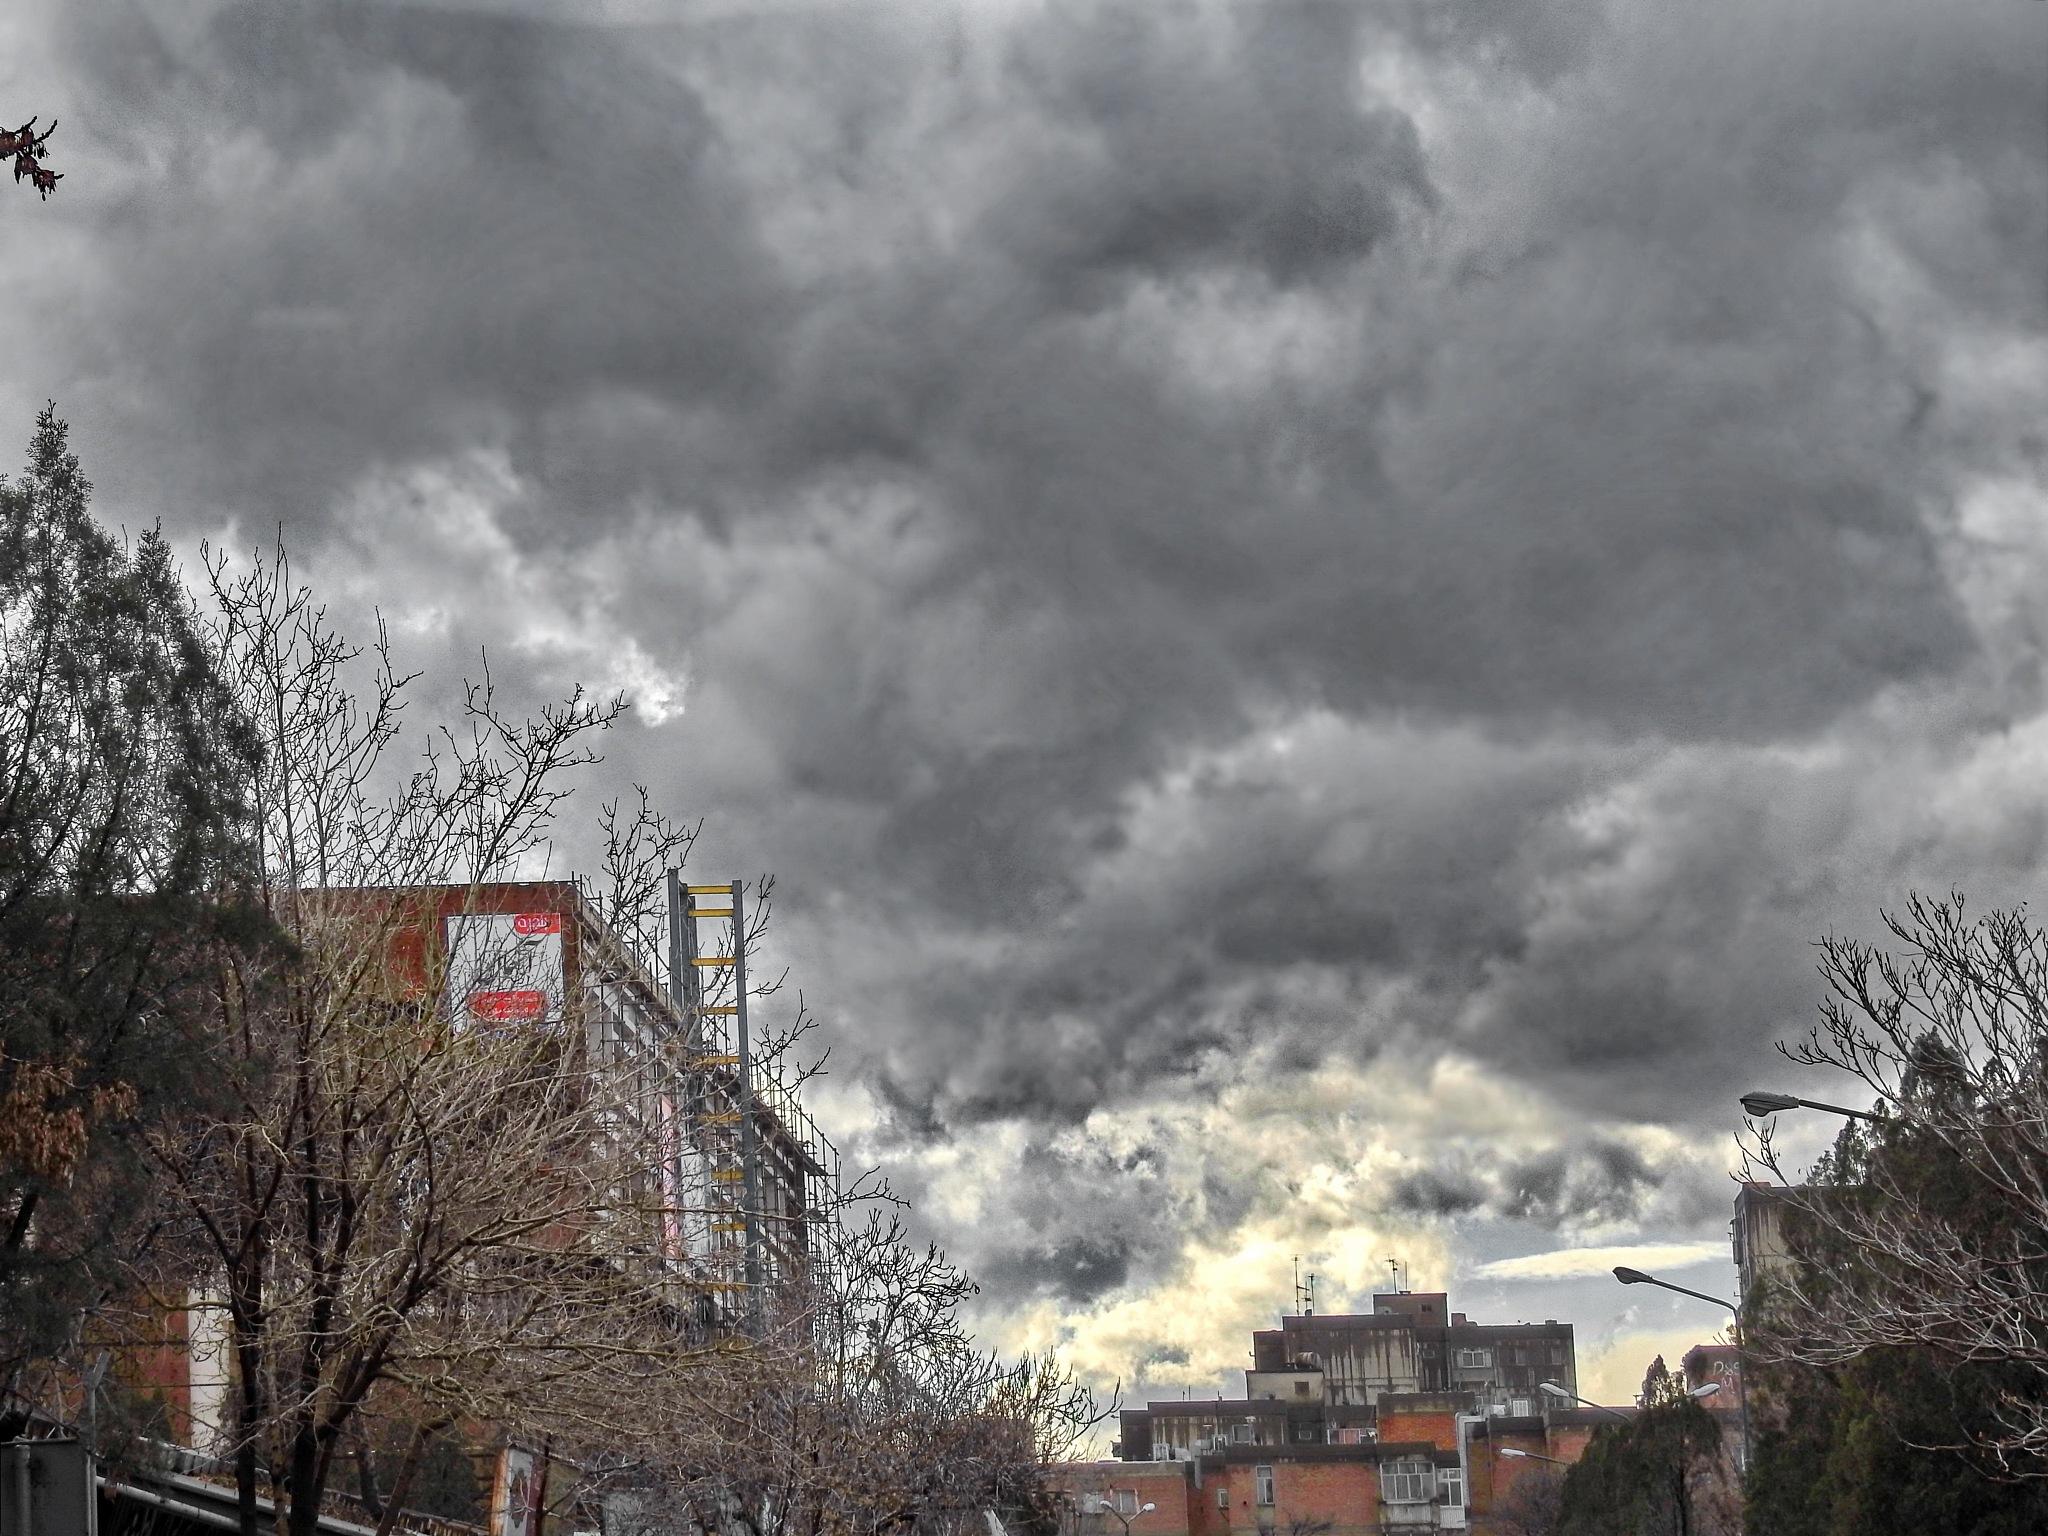 Cloudy by Aahmad Hezavei